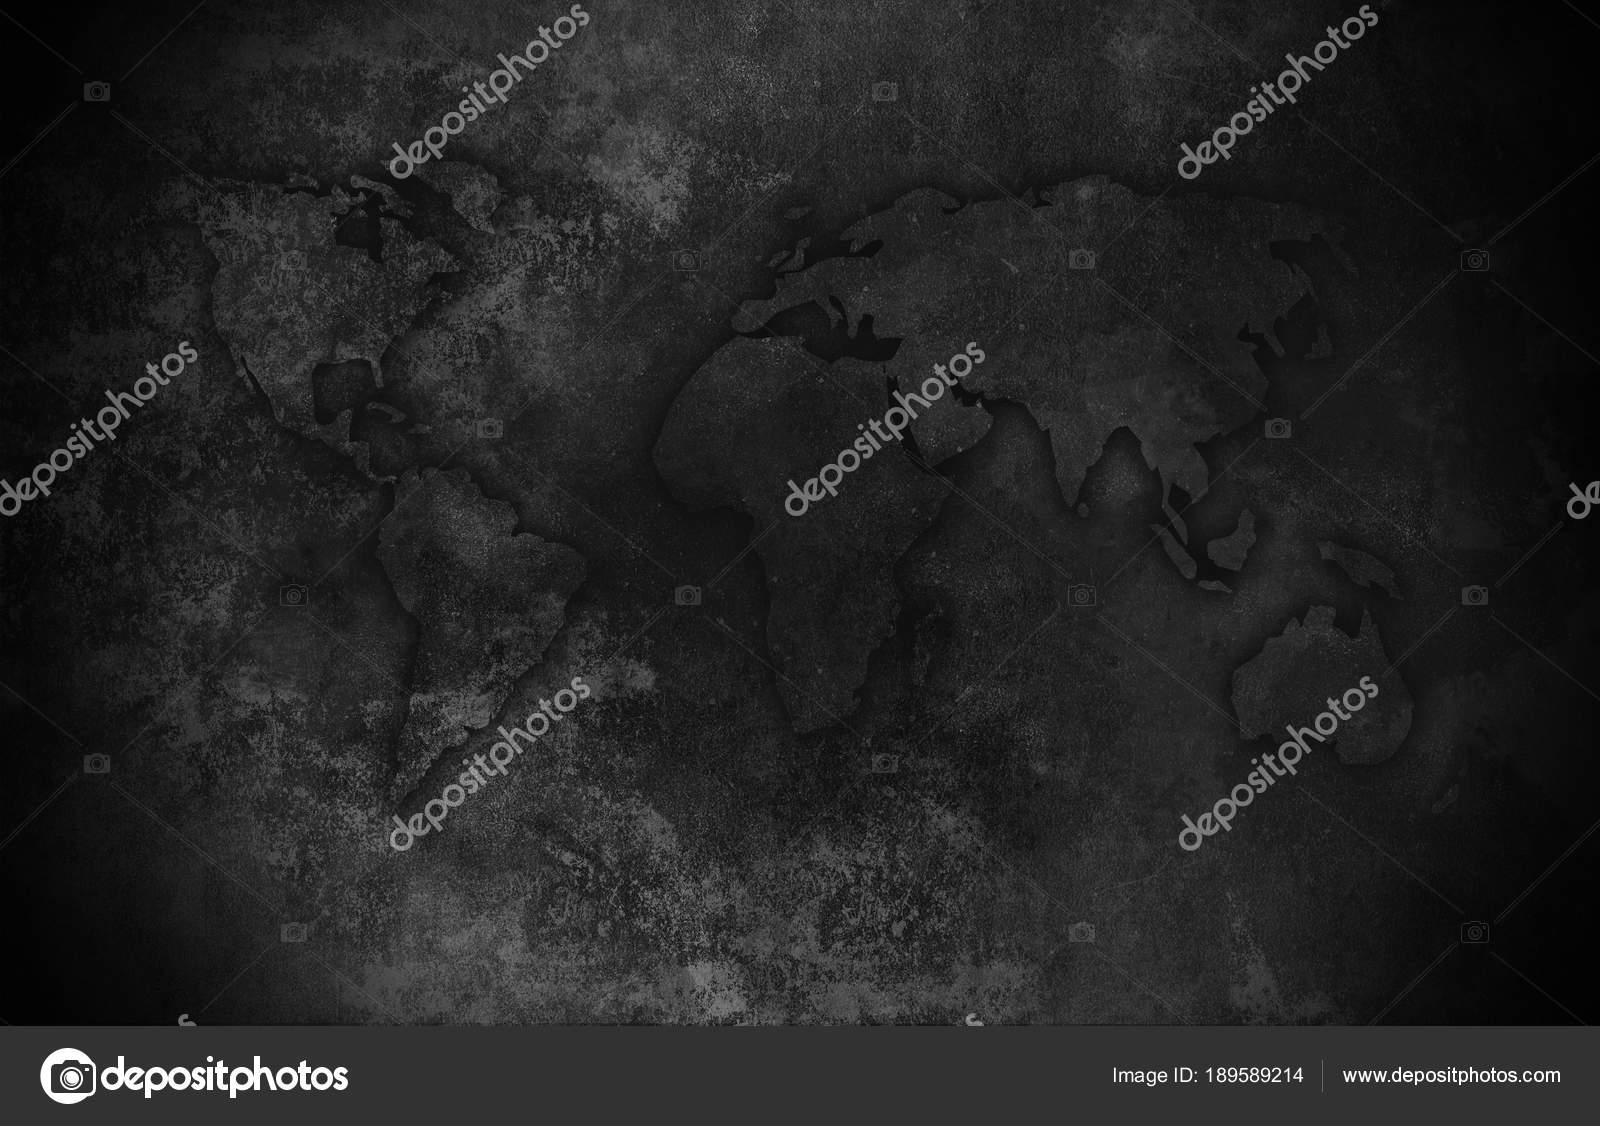 Silhouette world map dark background art stock photo vitalinag silhouette world map dark background art stock photo gumiabroncs Choice Image